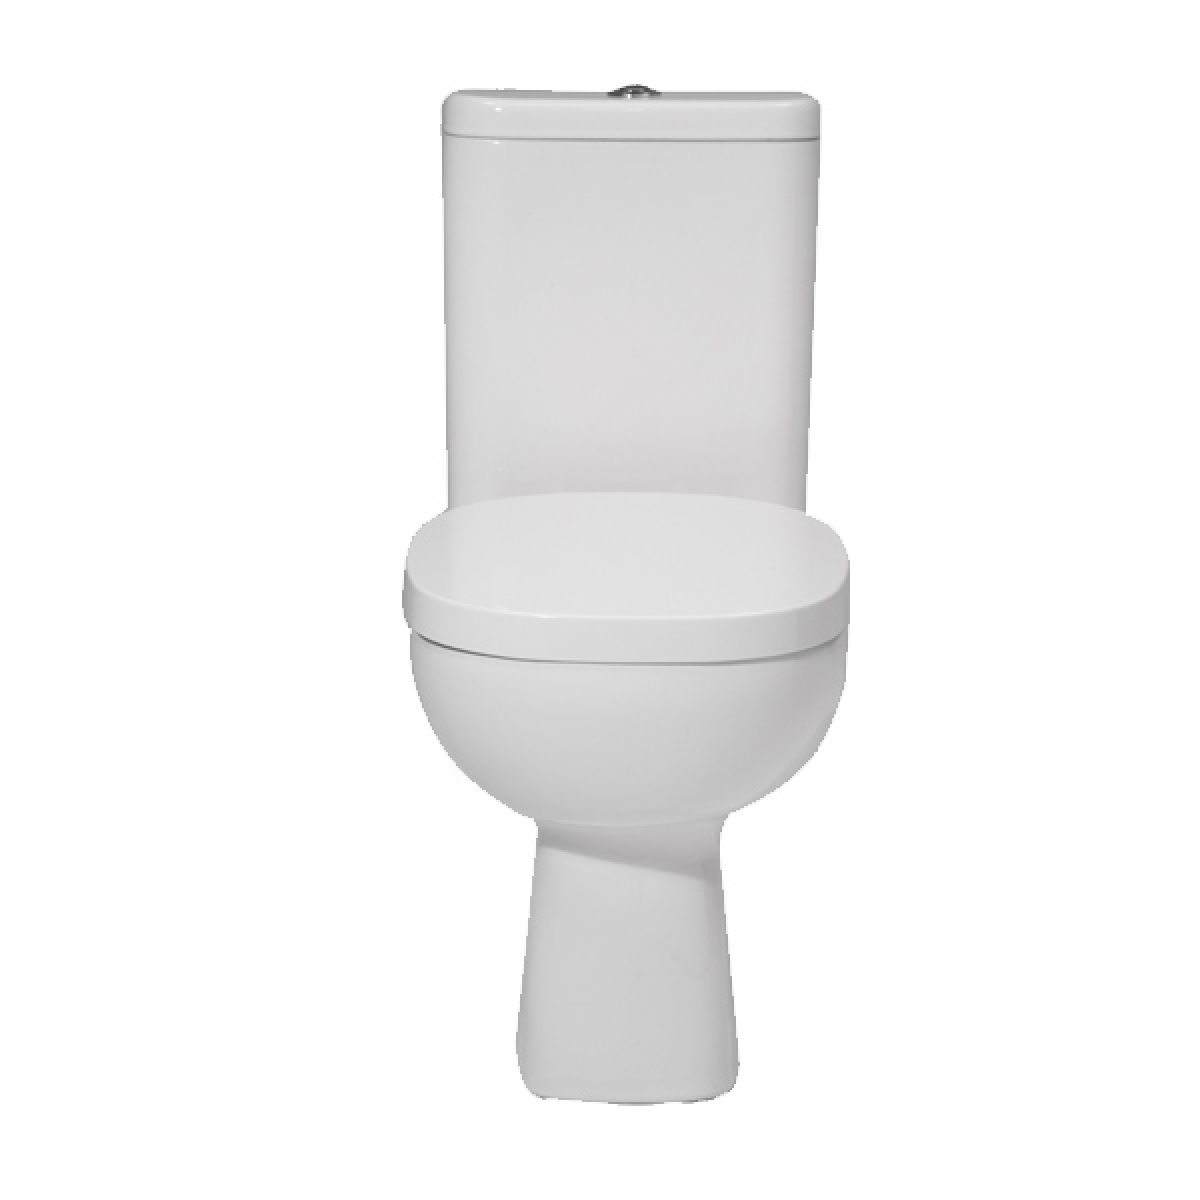 Frontline Petit2 Close Coupled Toilet